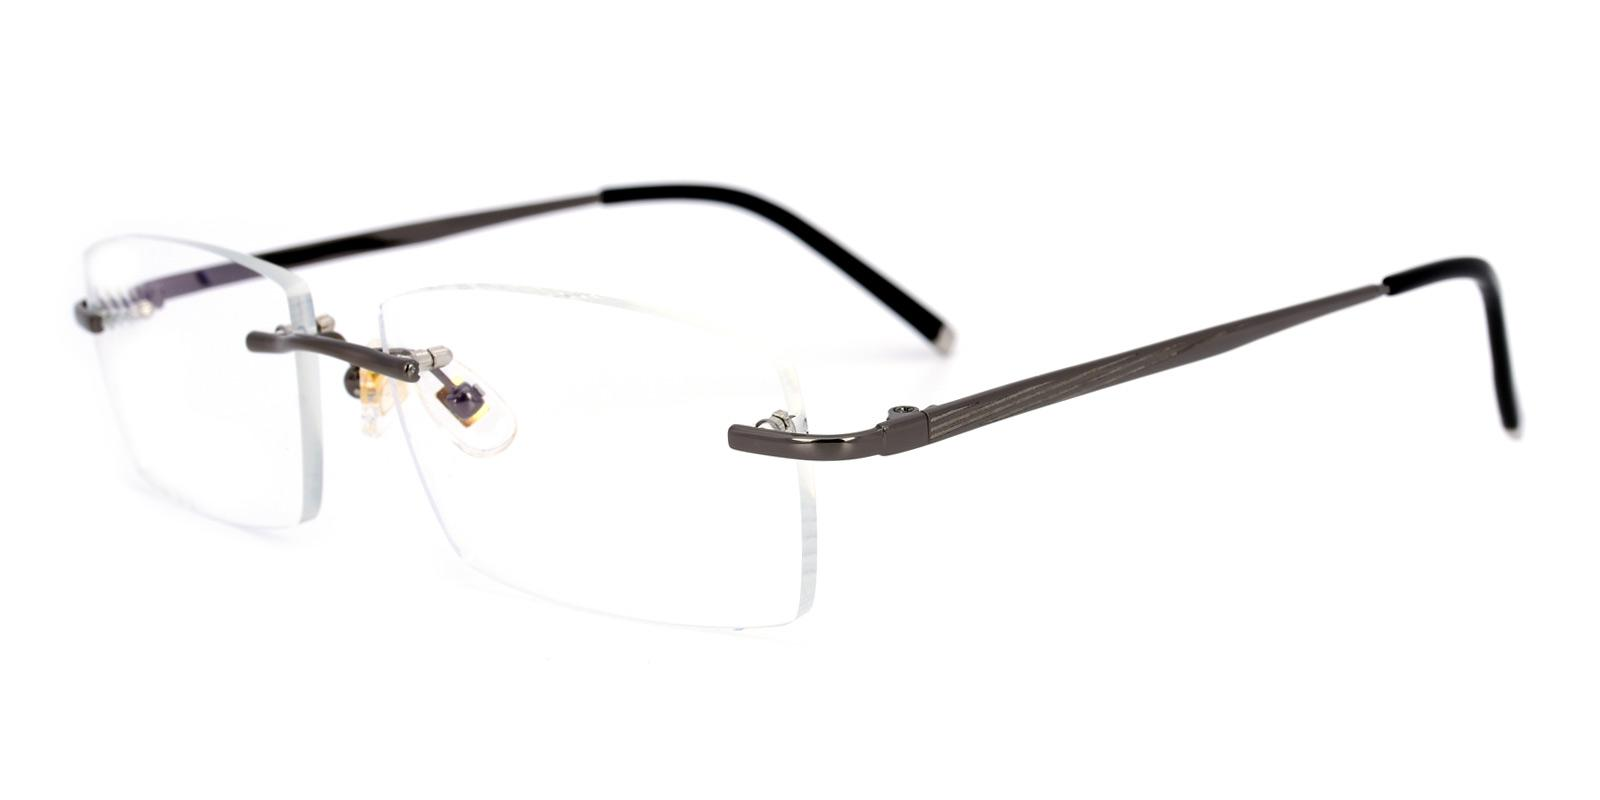 Edison-Gun-Varieties-Titanium-Eyeglasses-detail